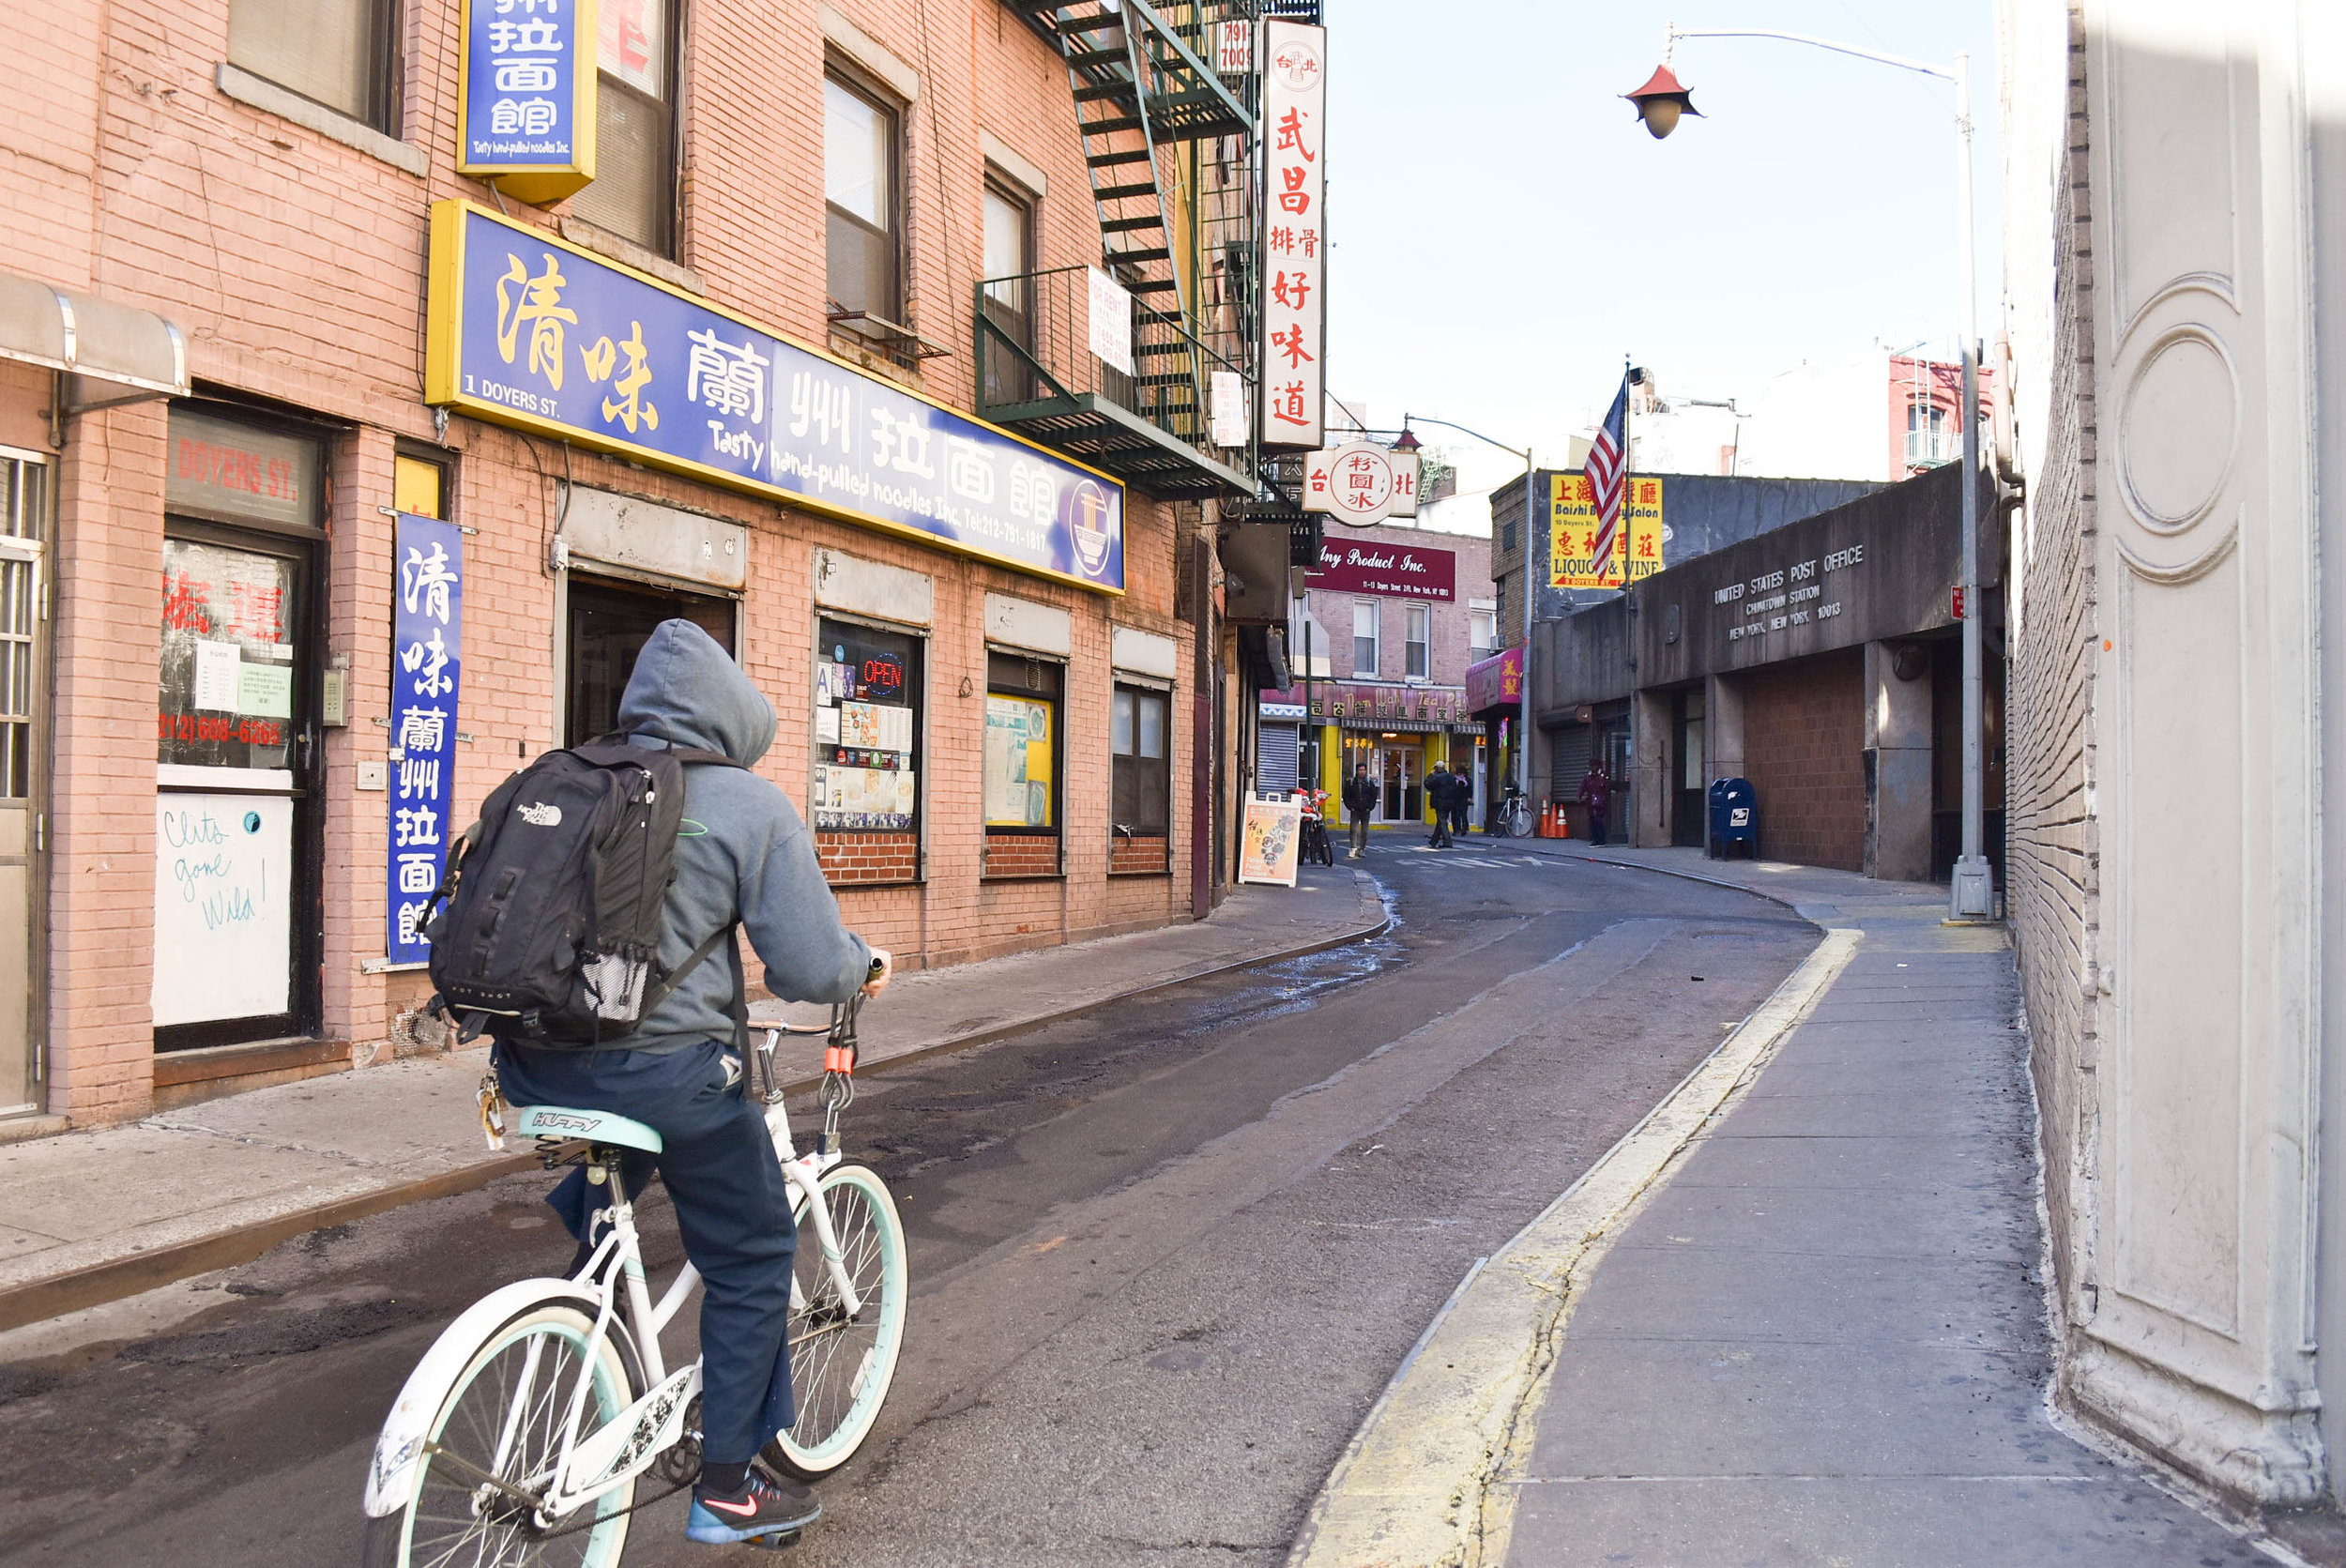 Man in bike, Chinatown, NYC